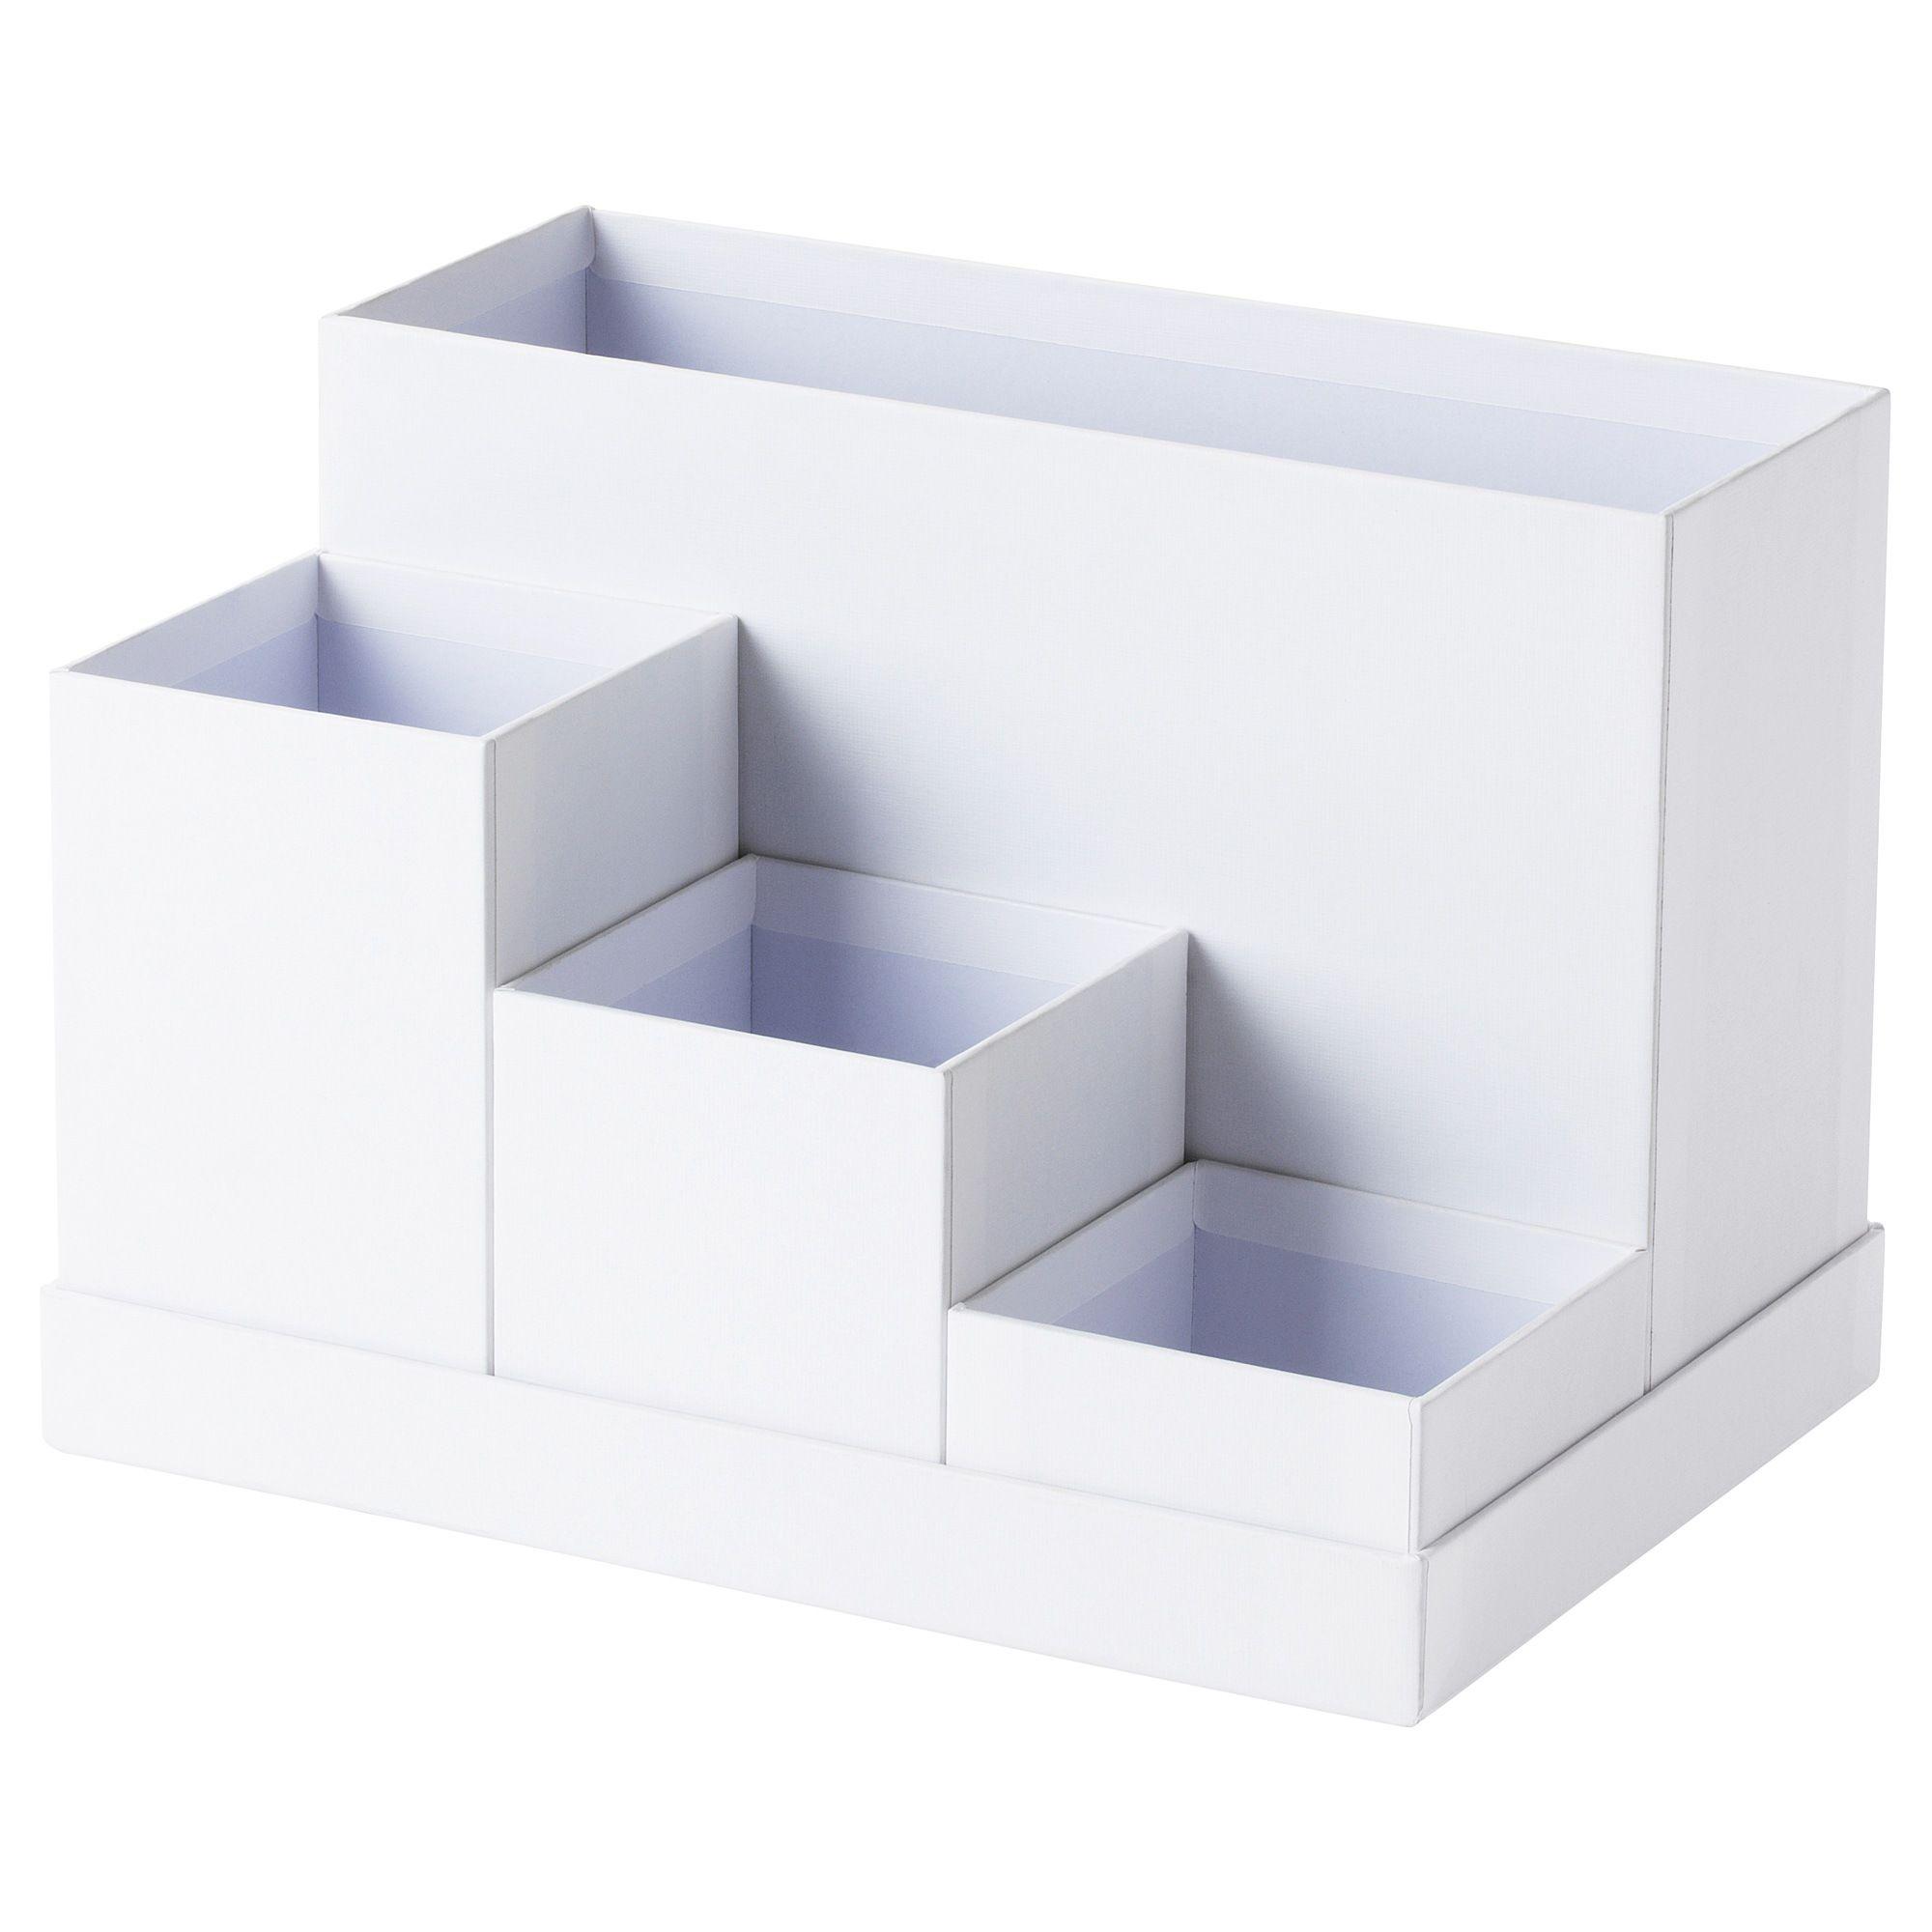 Tjena Desk Organizer White 7x6 Ikea Desk Organization Diy Desk Organization Desk Organization Ikea